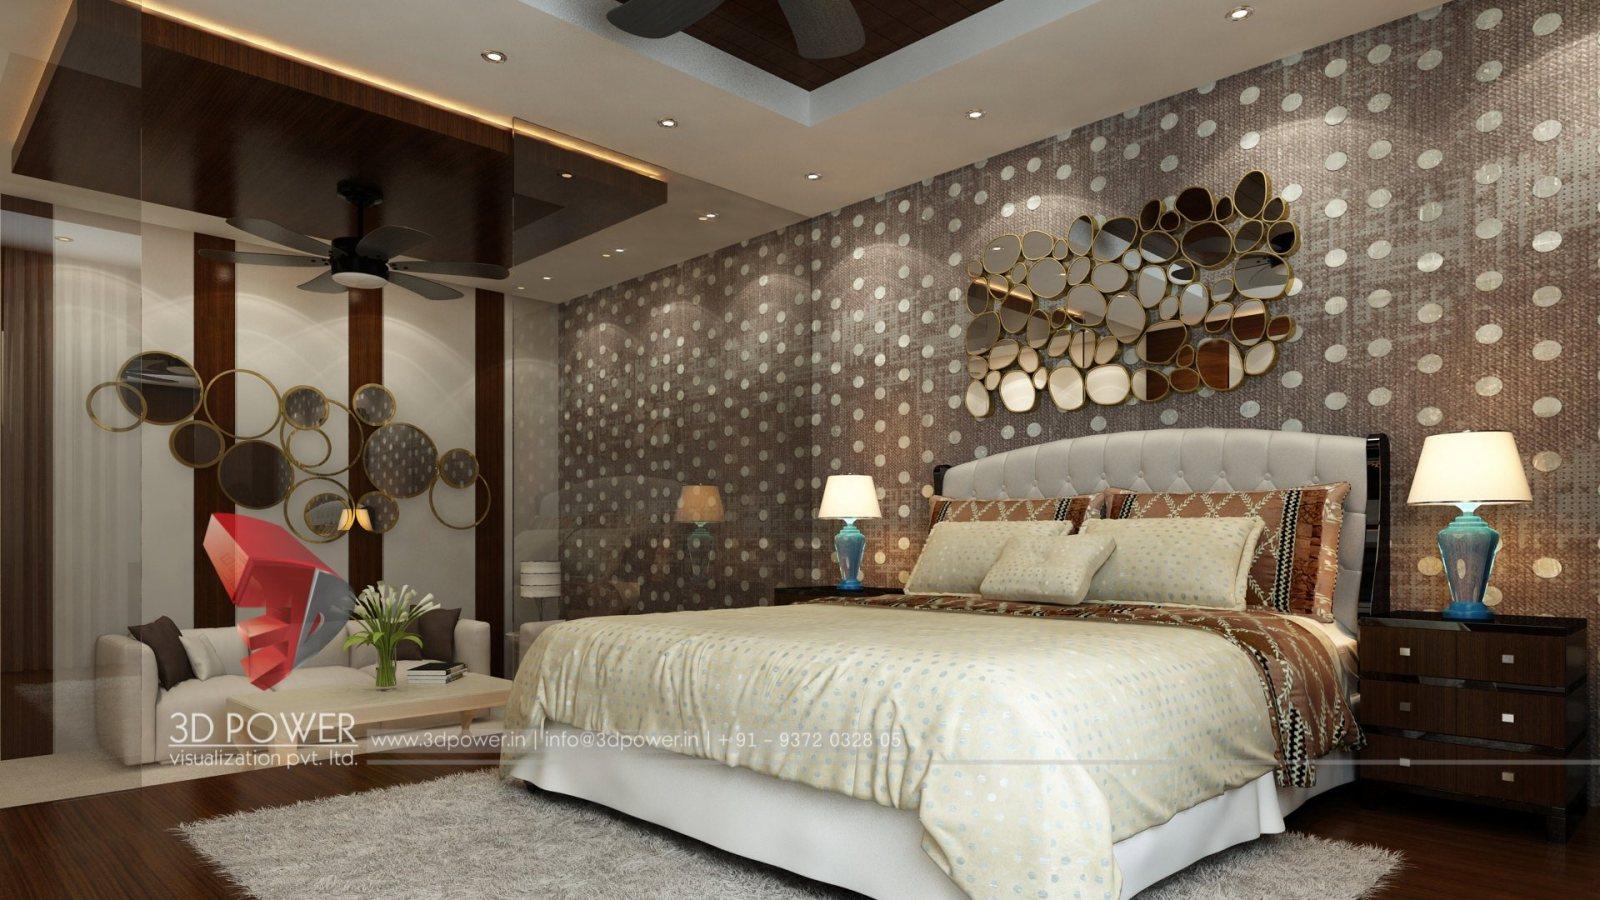 Decorative-Mirrors-Bungalow-Rendering